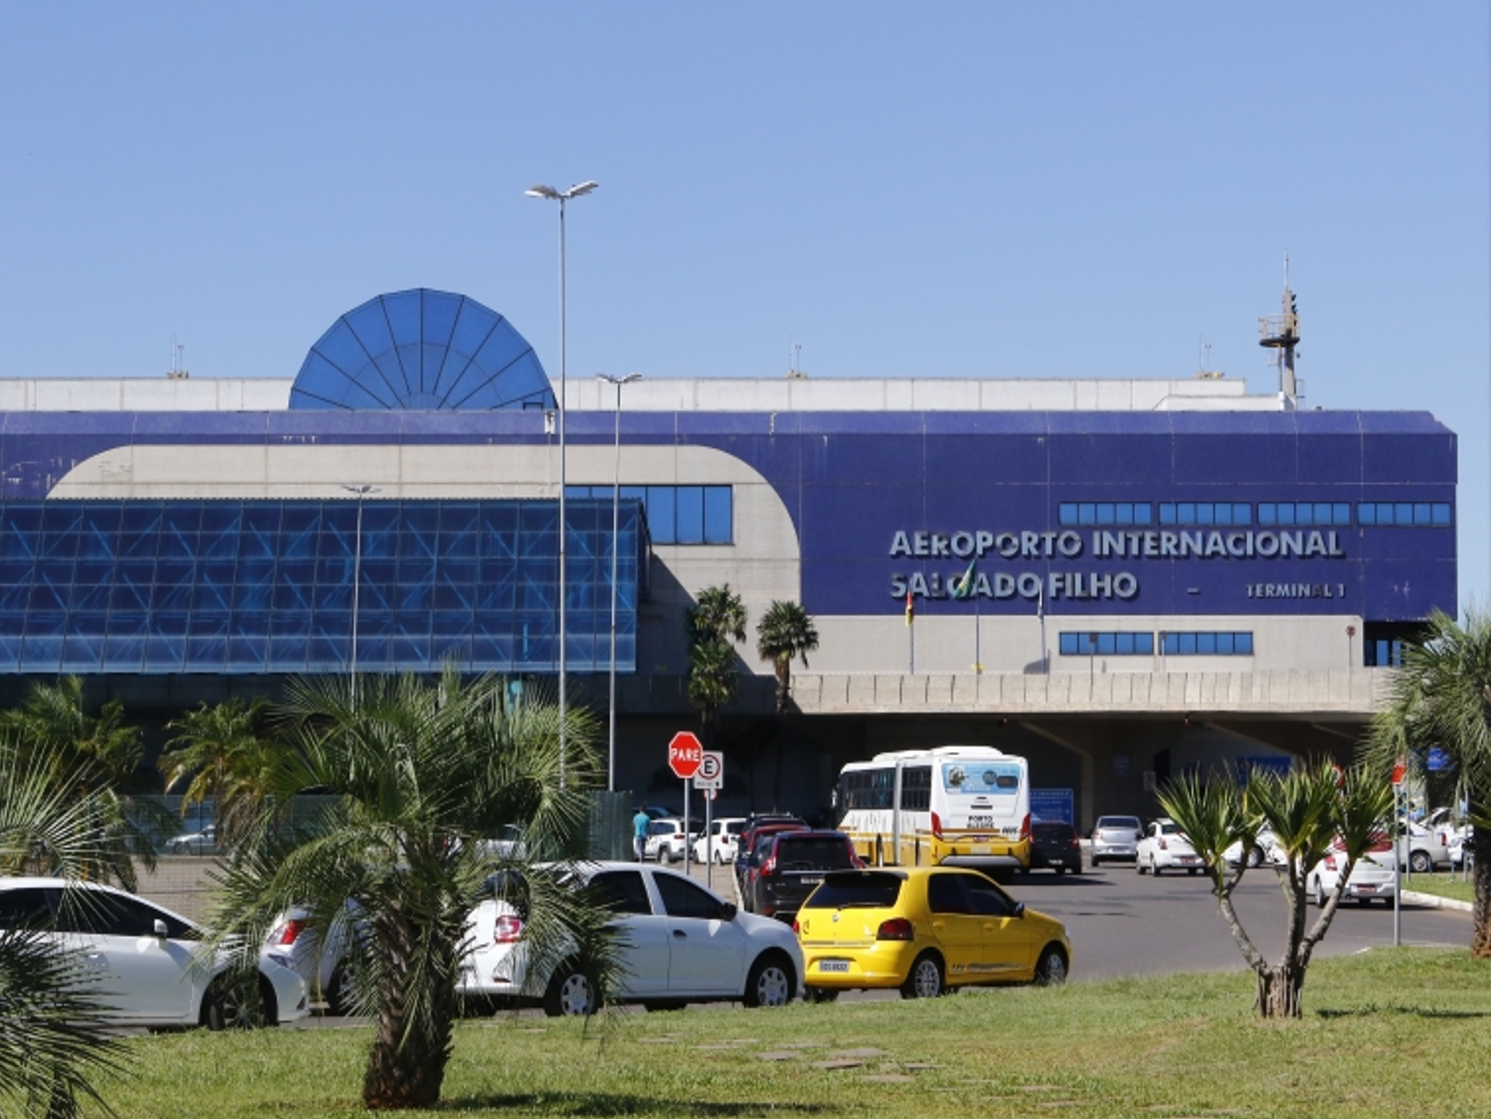 transporte aeroporto porto alegre caxias do sul